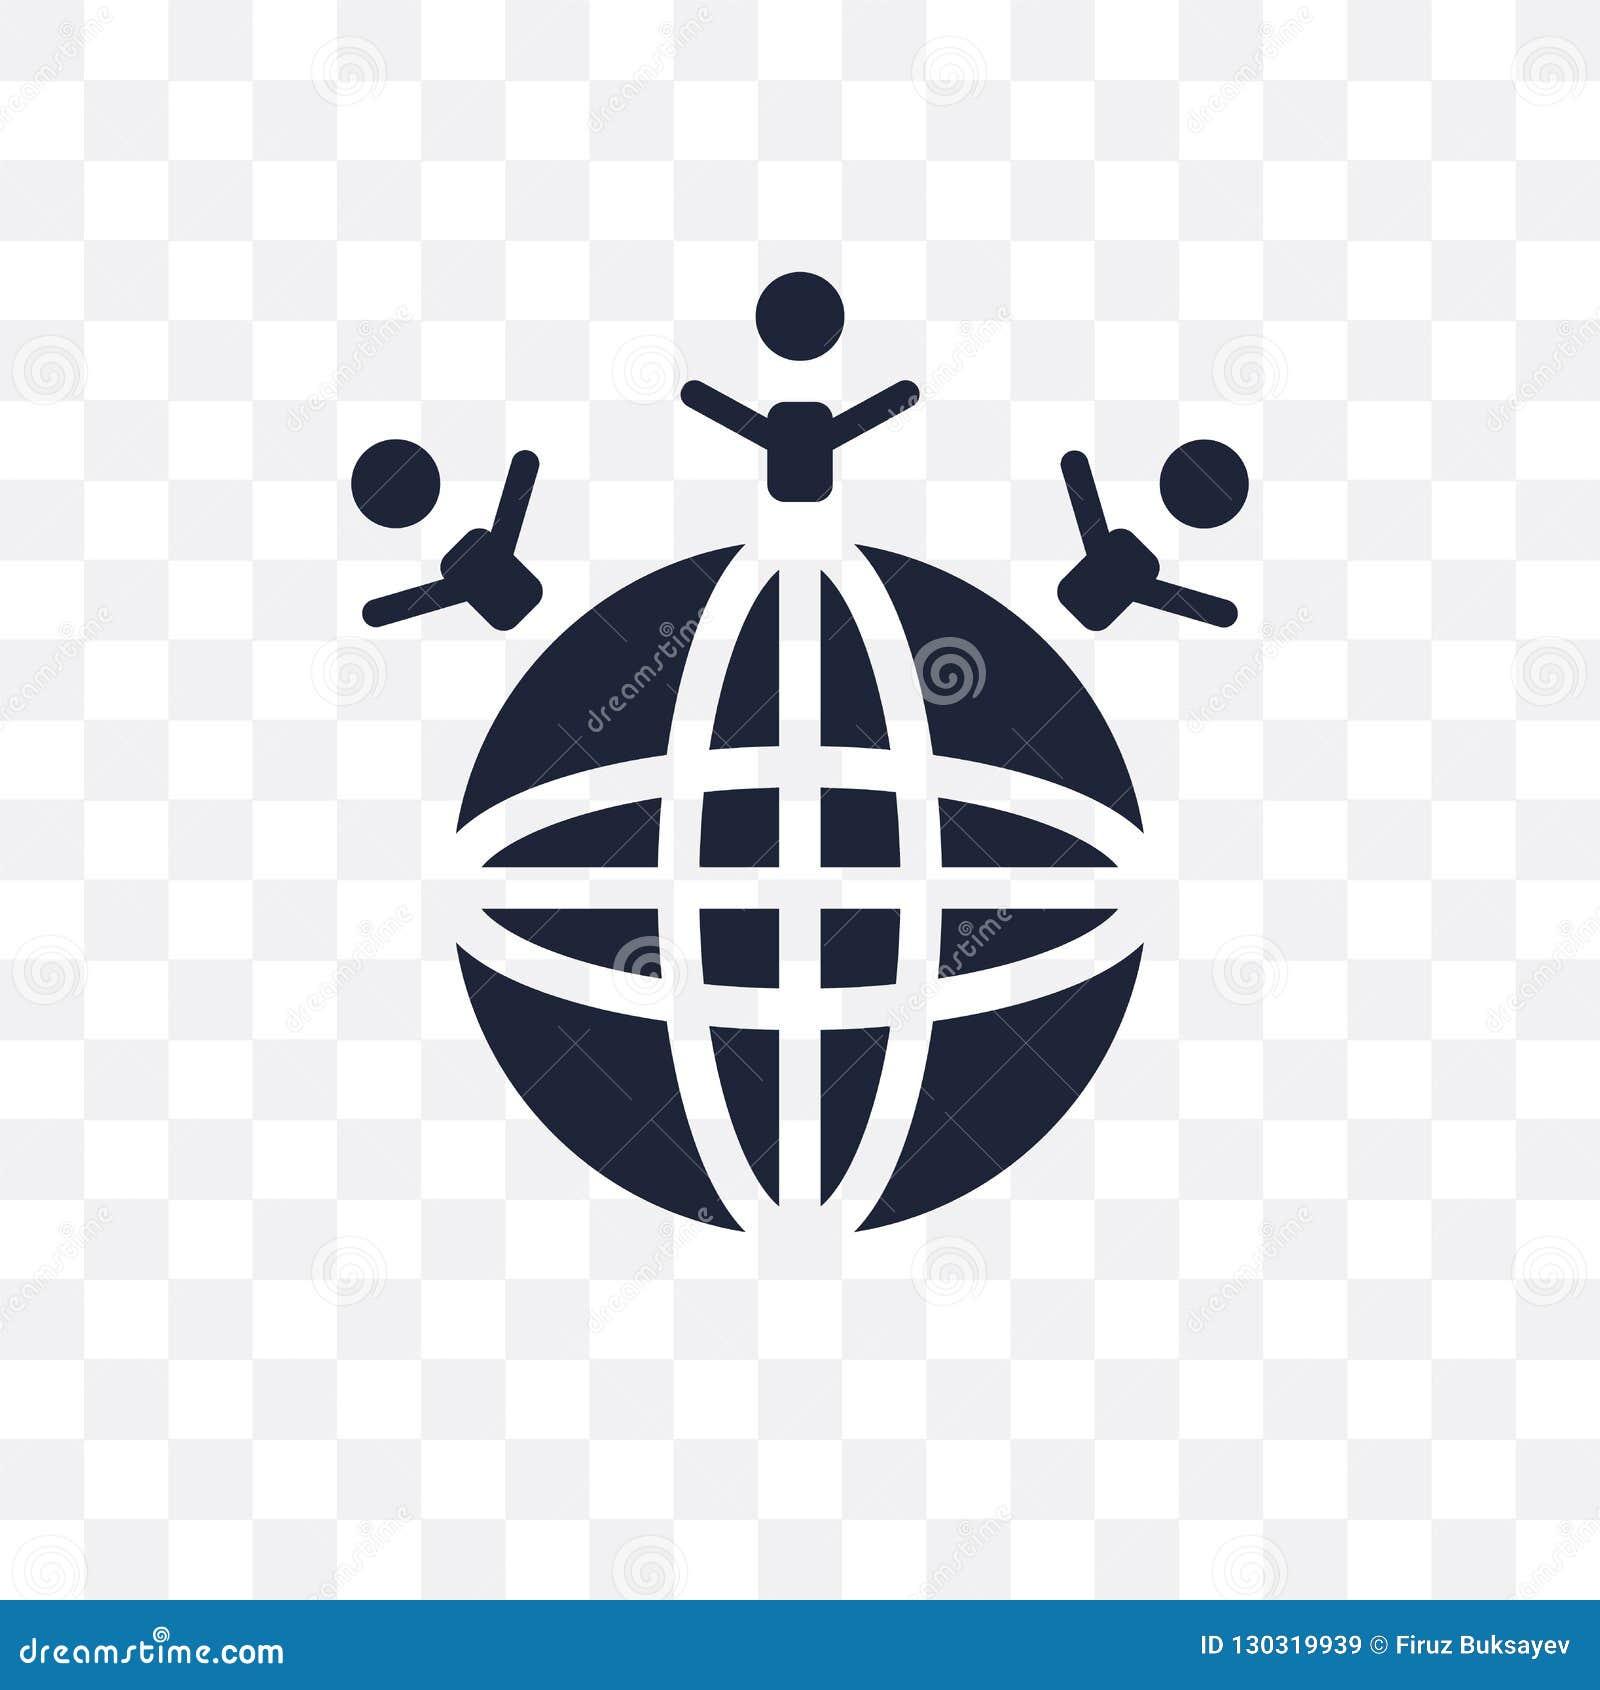 Save The World Transparent Icon  Save The World Symbol